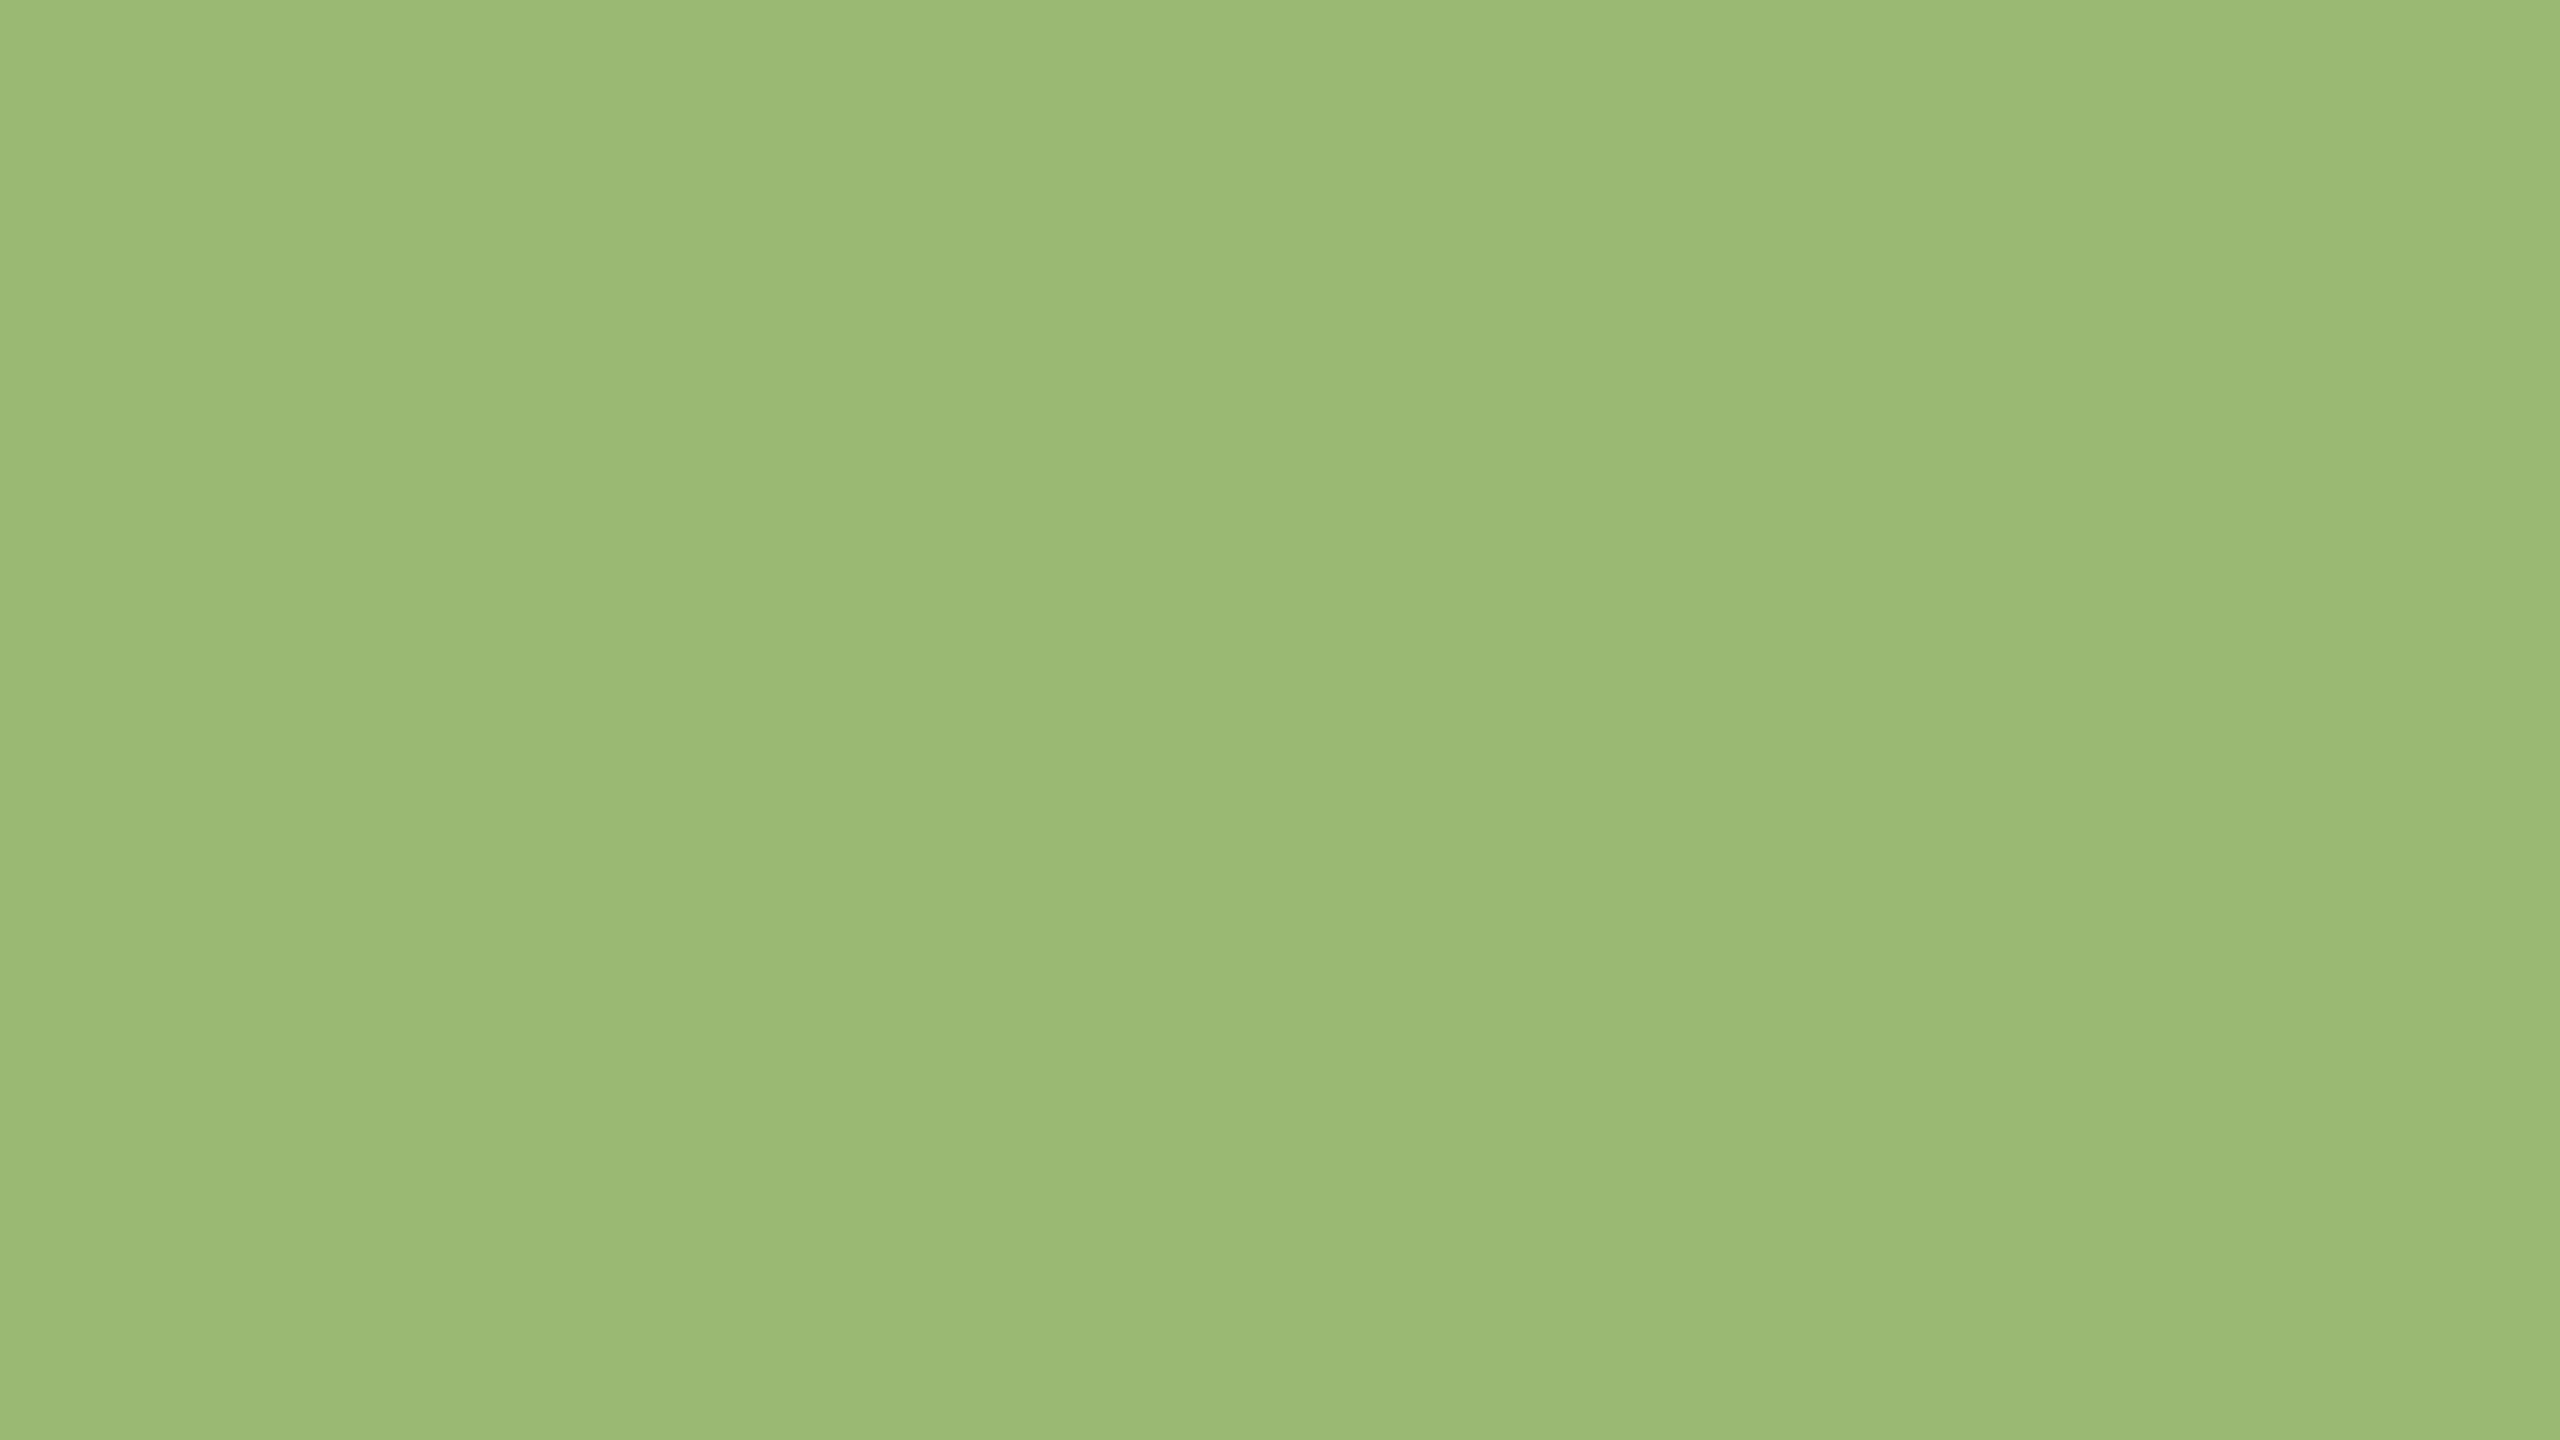 2560x1440 Olivine Solid Color Background